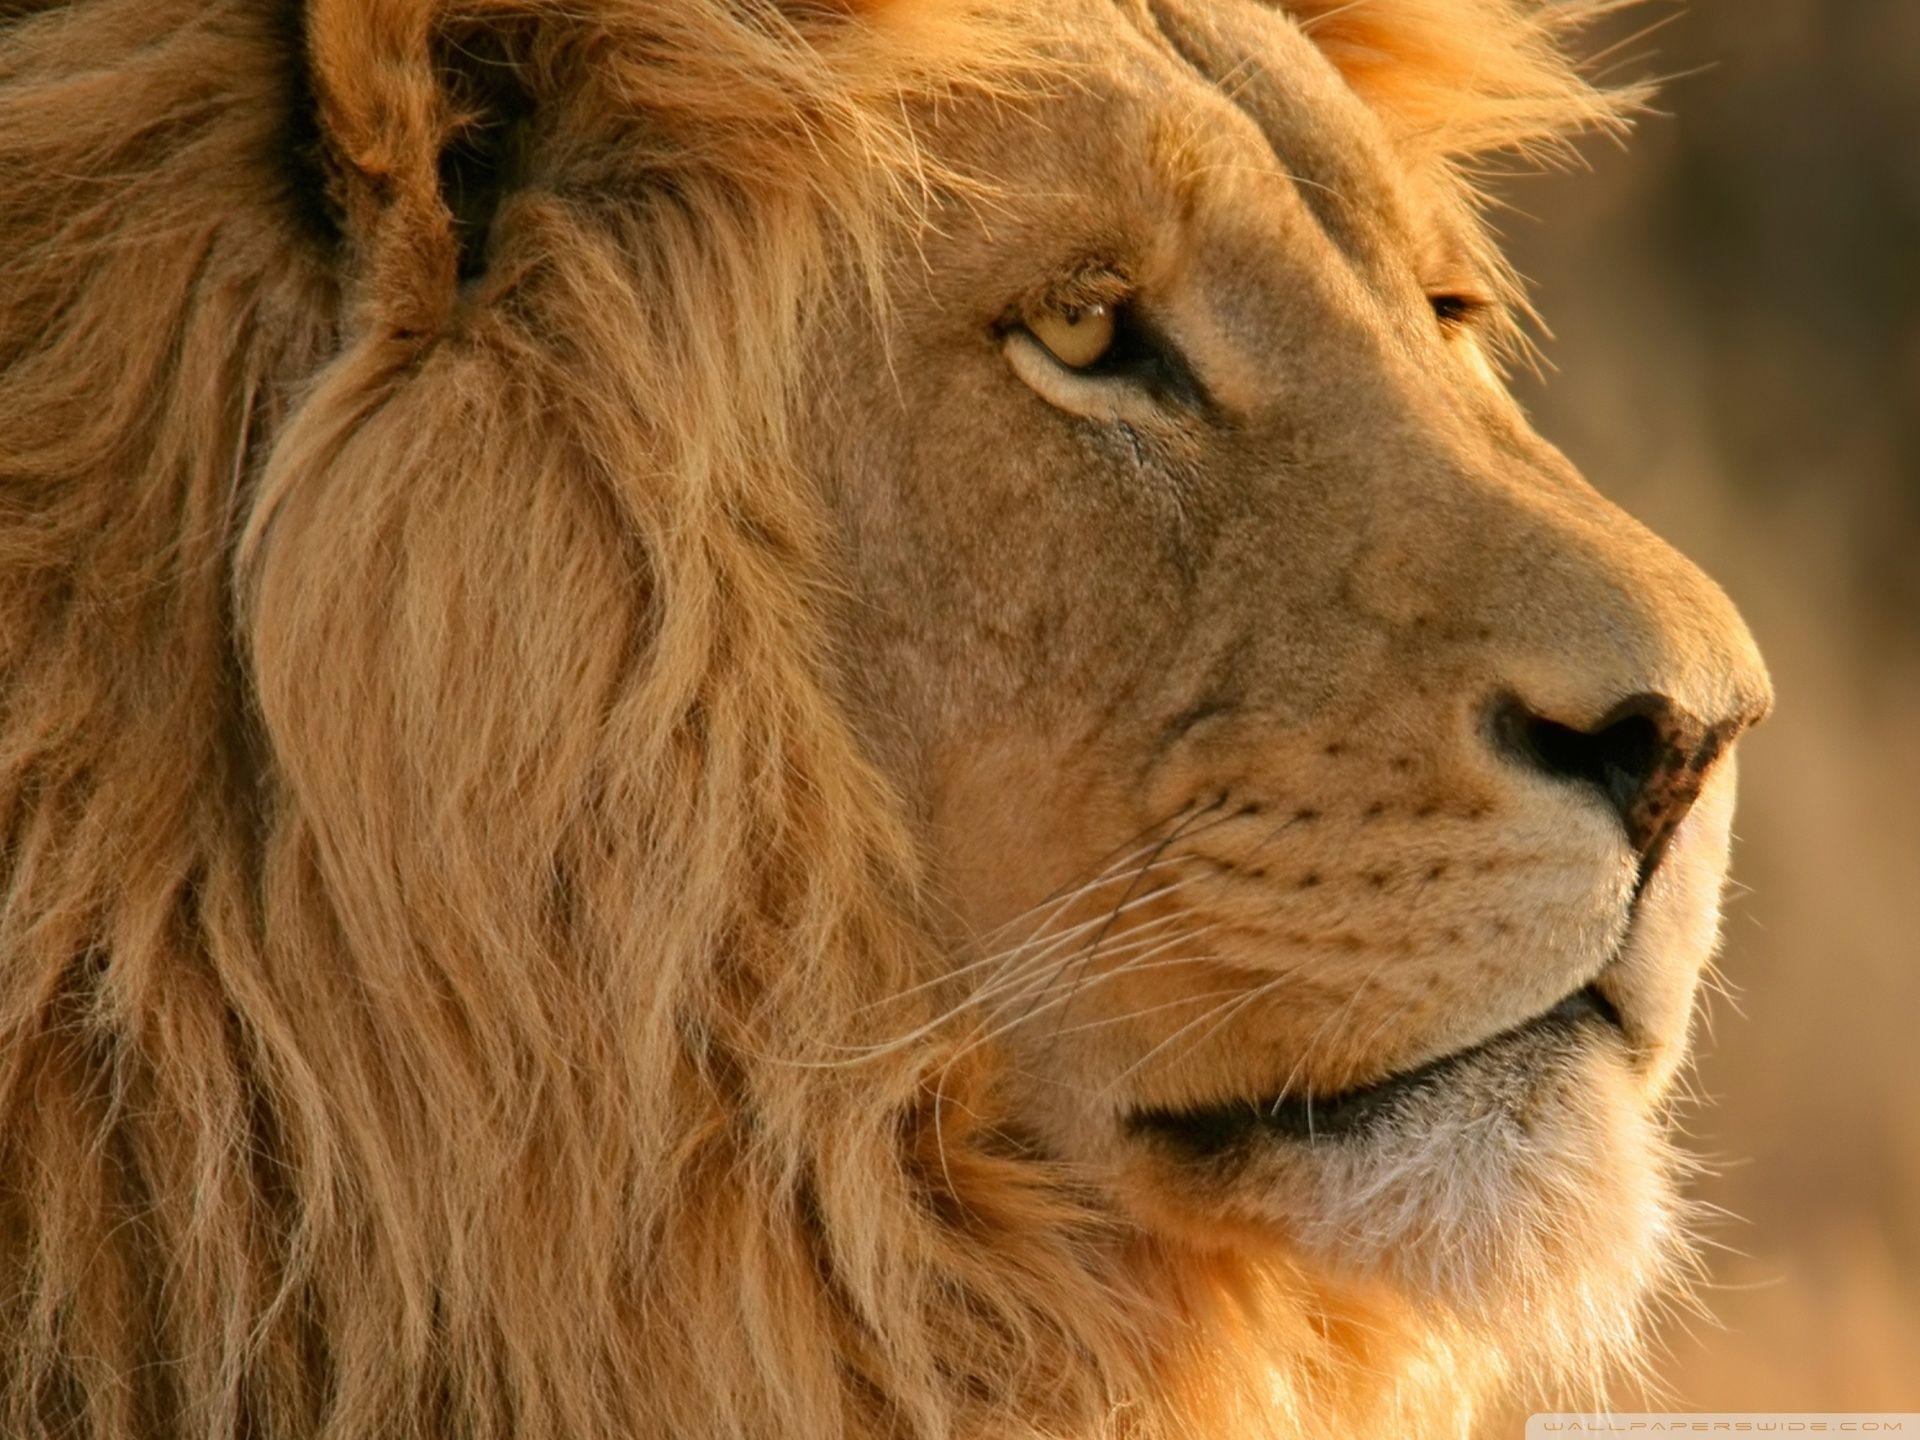 Apple Lion Wallpaper